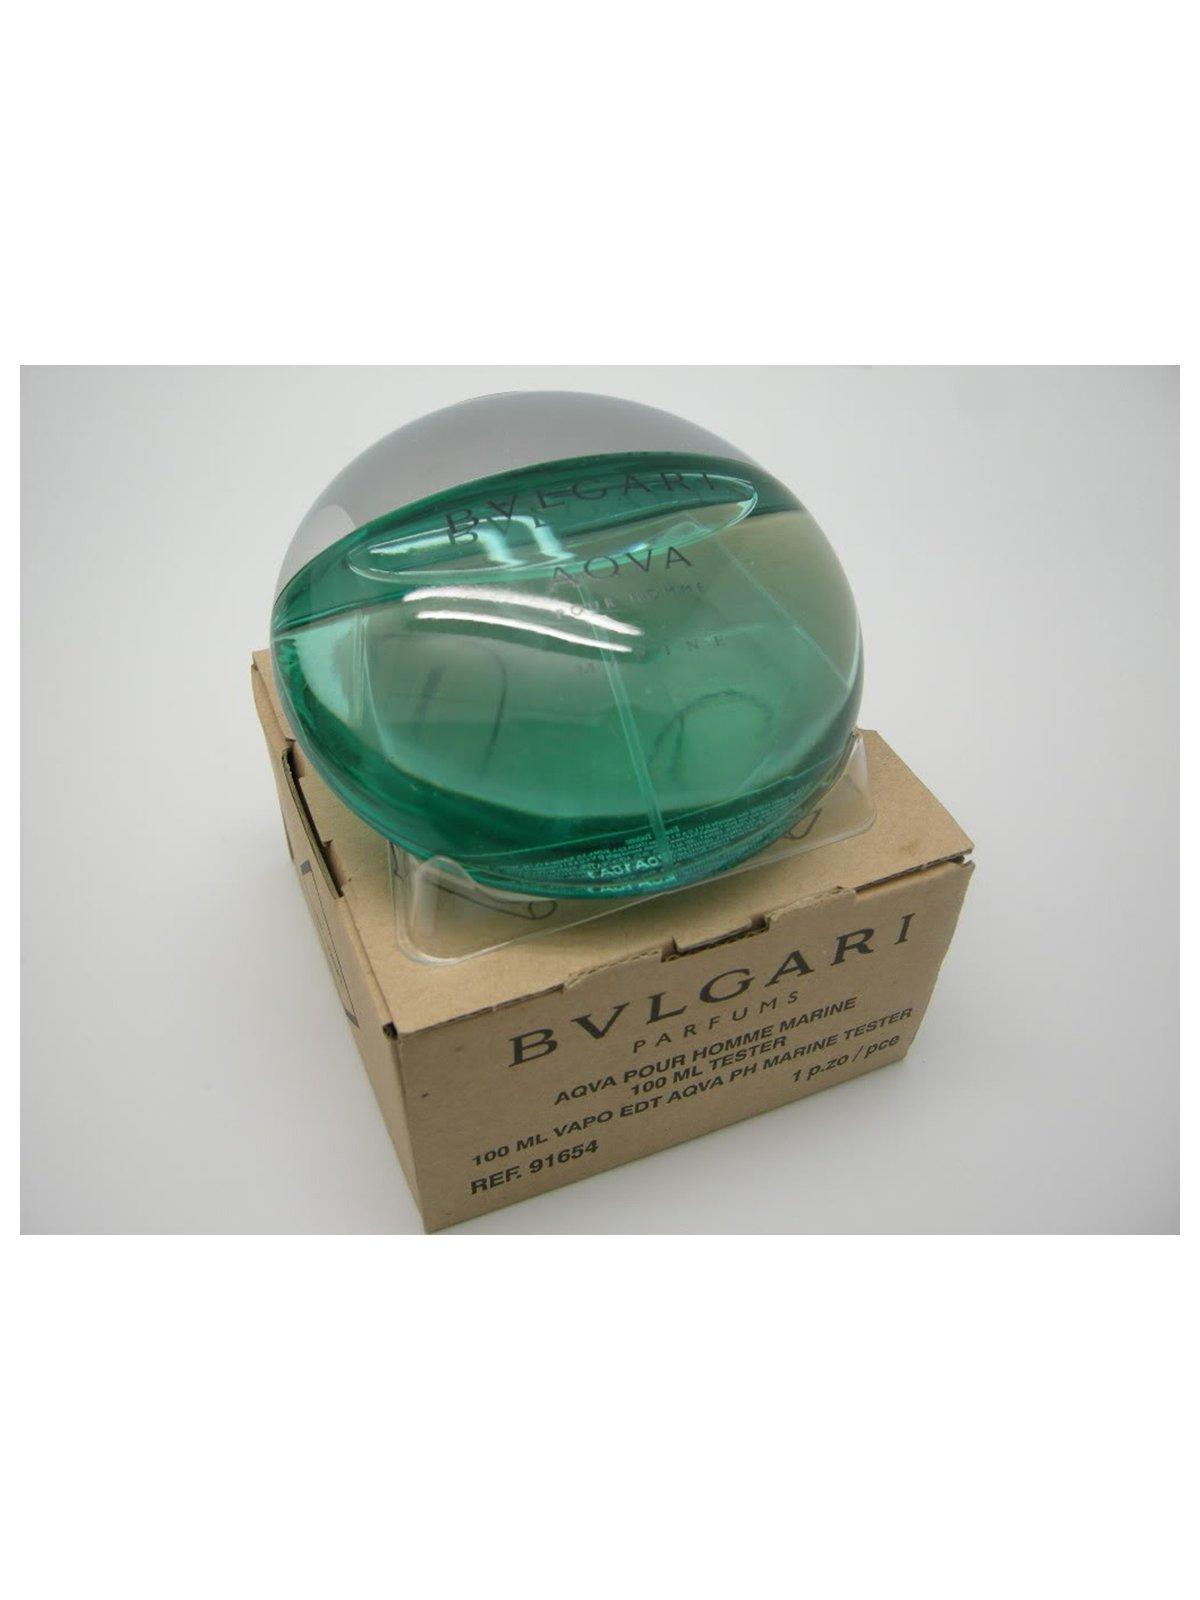 Туалетна вода Aqva Pour Homme Marine (100 мл) — тестер   3617664